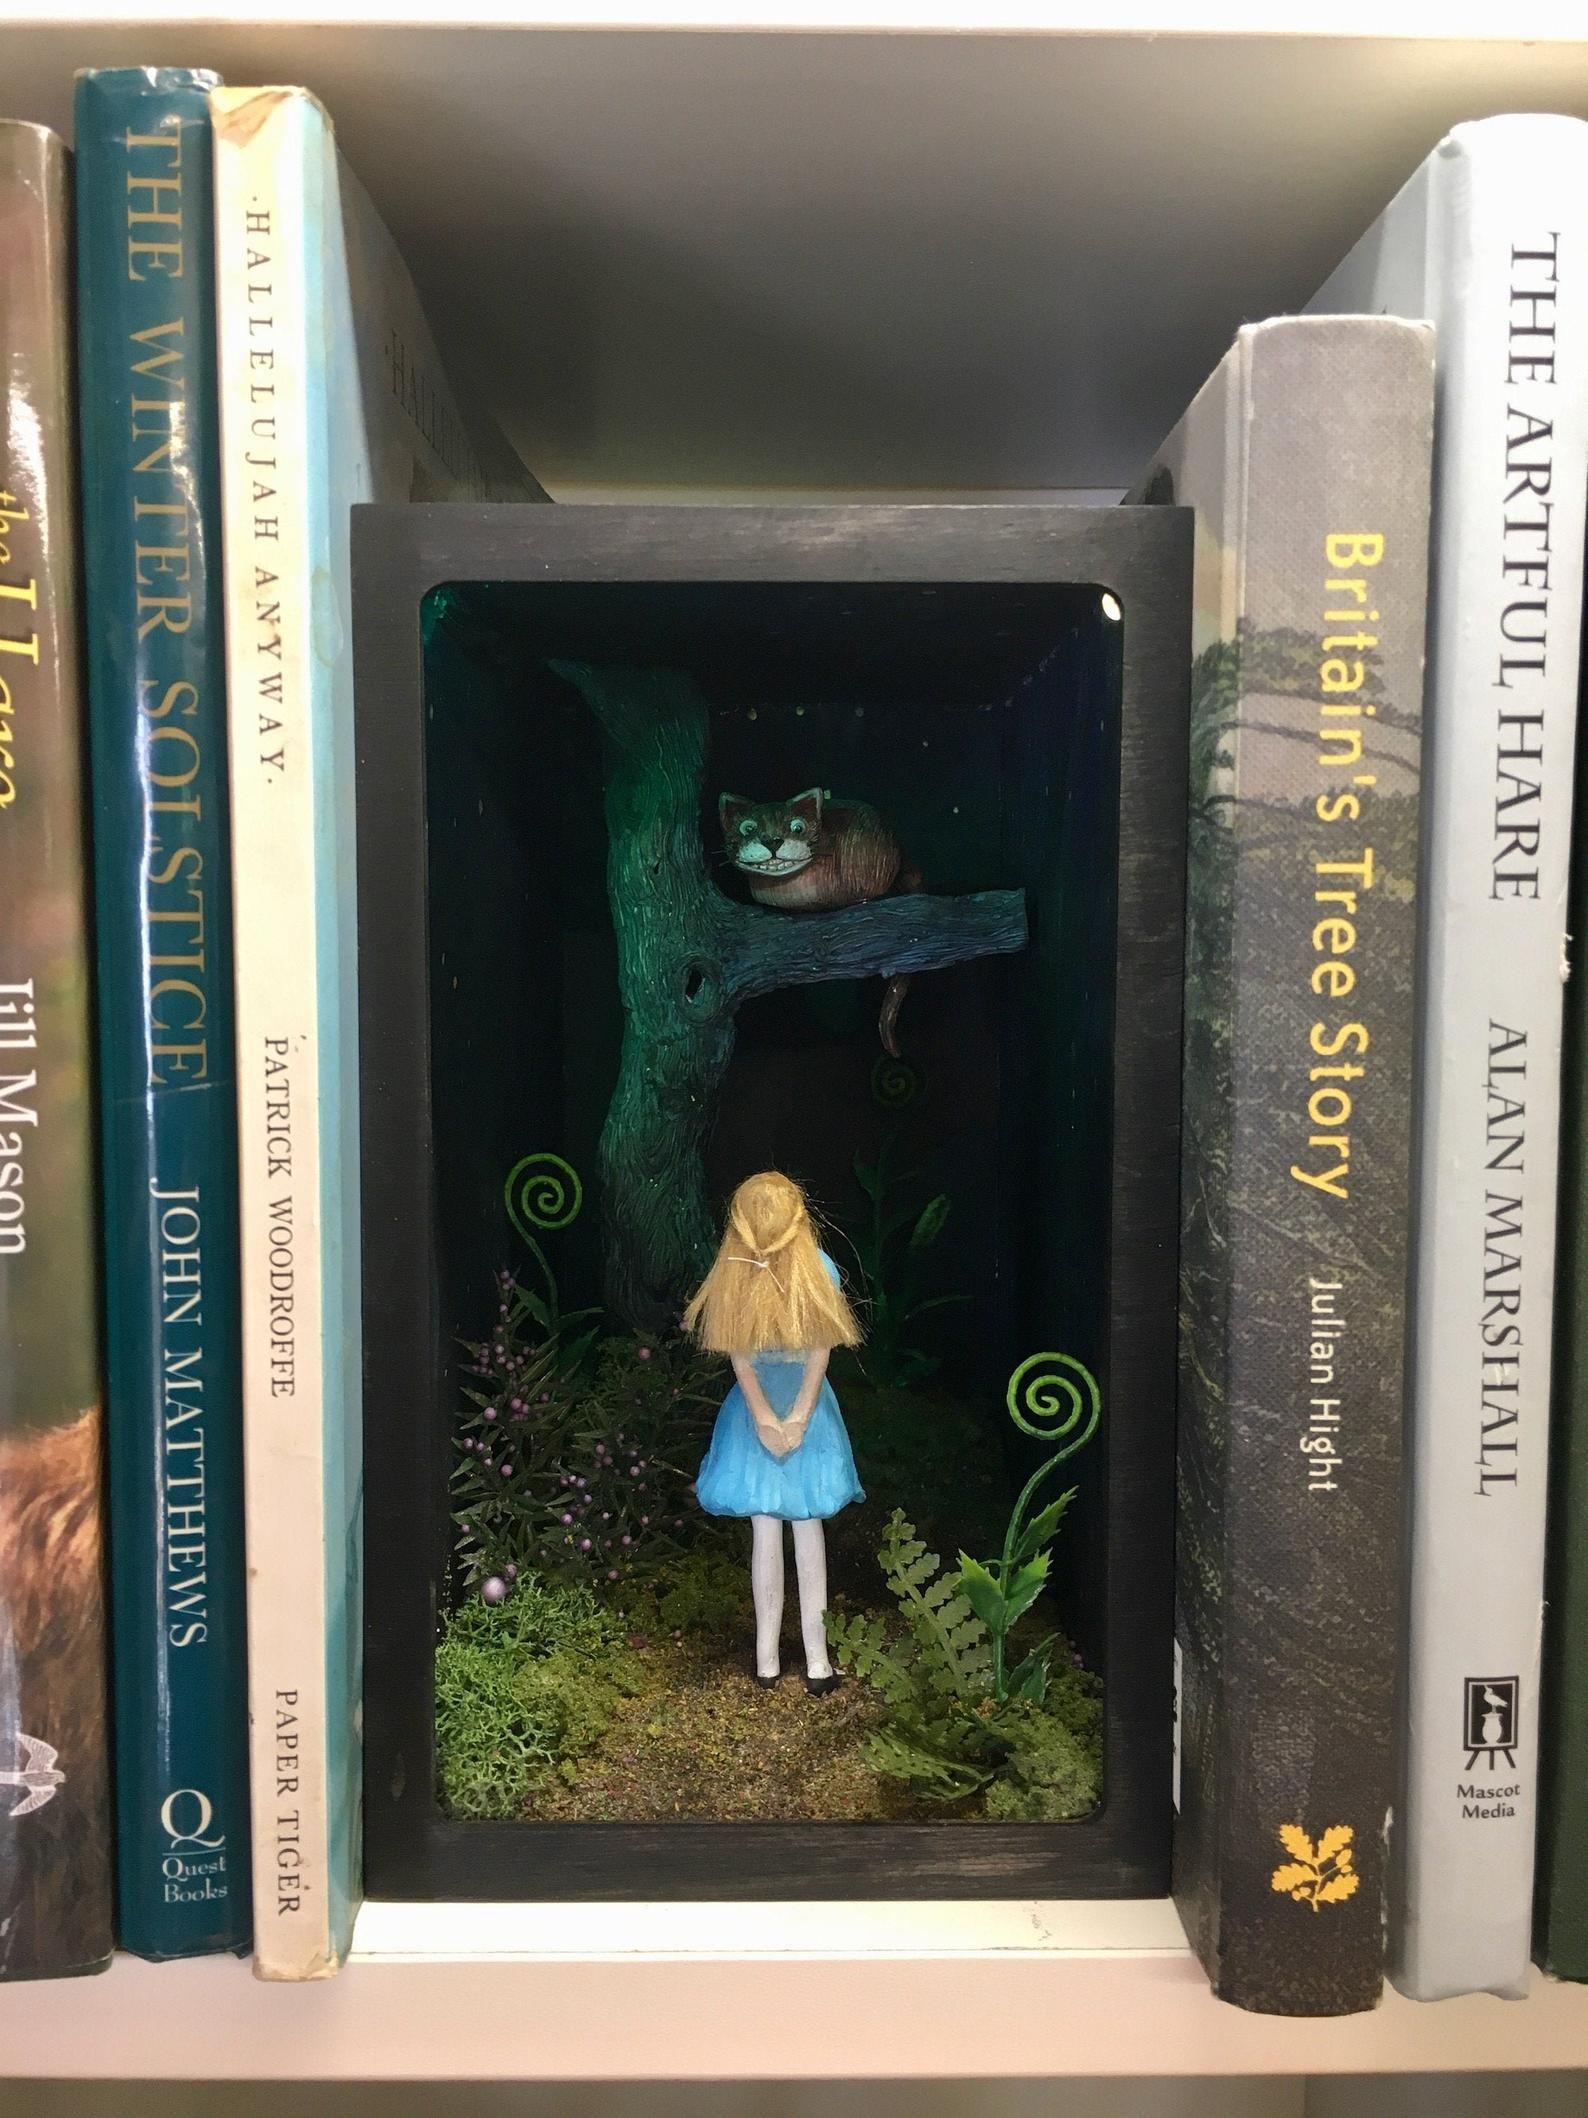 Lit Alice In Wonderland Book Nook Diorama Bookshelf Shadow Box Etsy In 2020 Alice In Wonderland Book Book Nooks Bookshelf Art